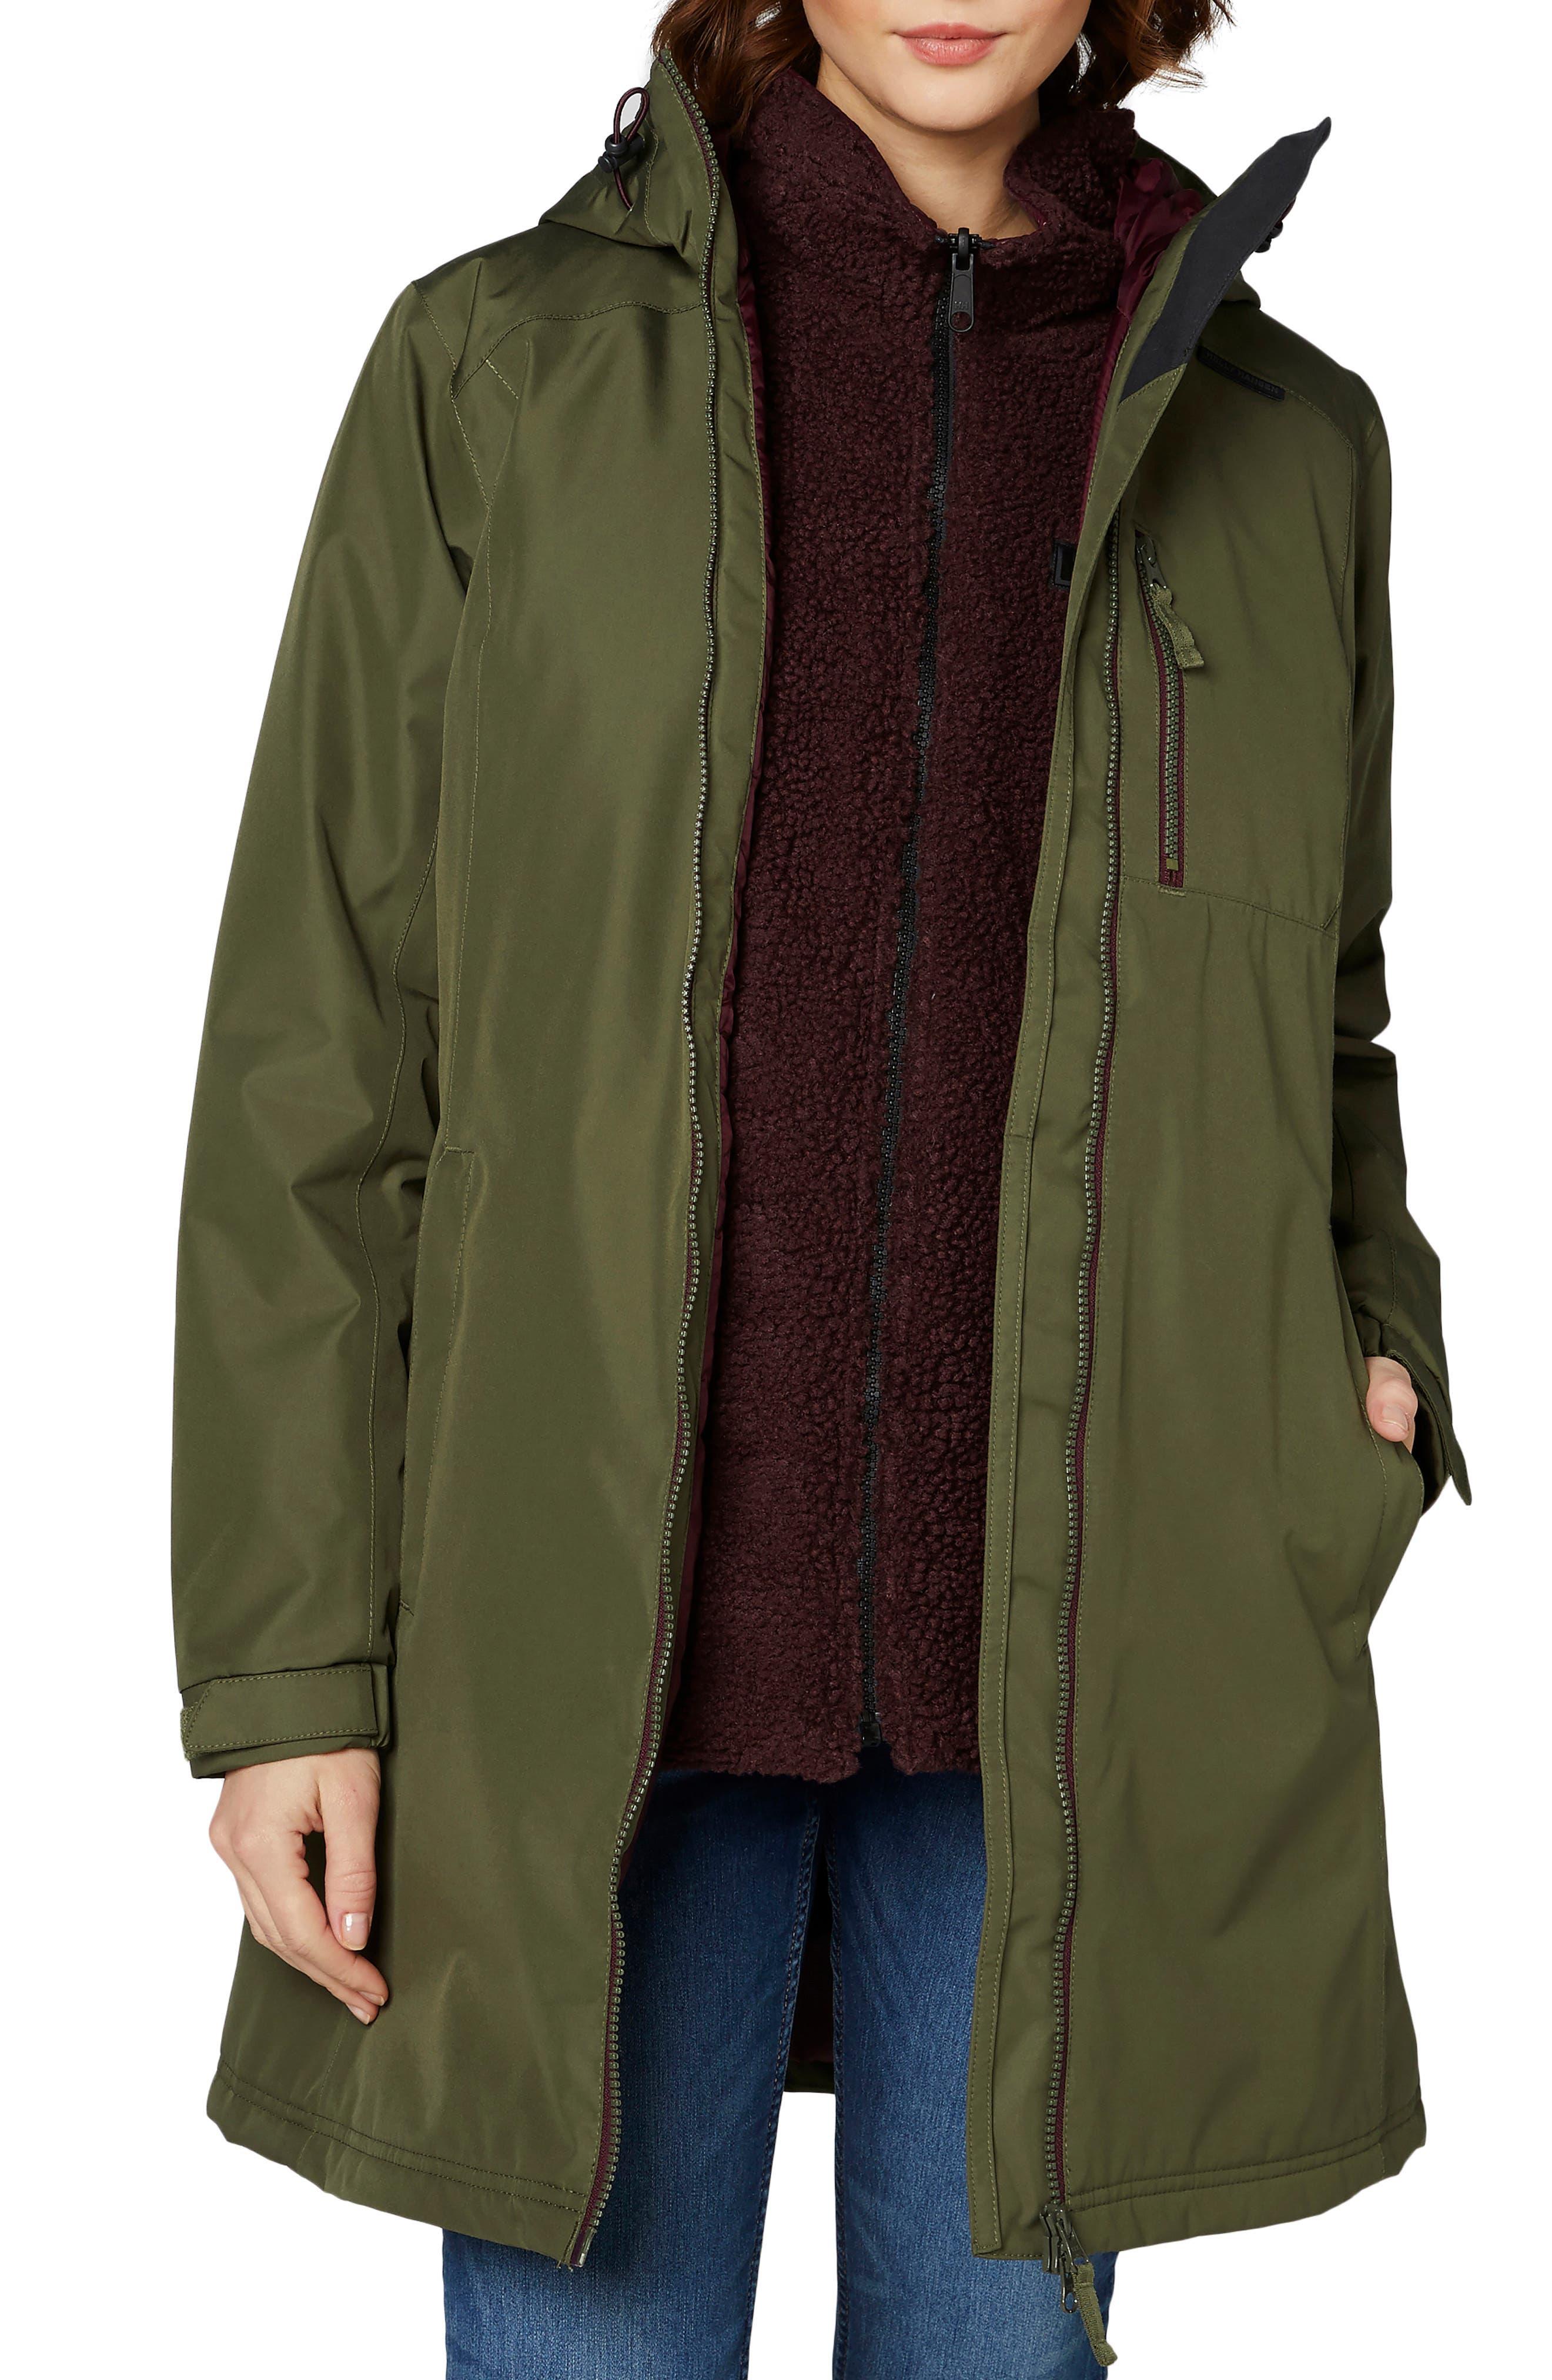 HELLY HANSEN 'Belfast' Long Waterproof Winter Rain Jacket, Main, color, 391